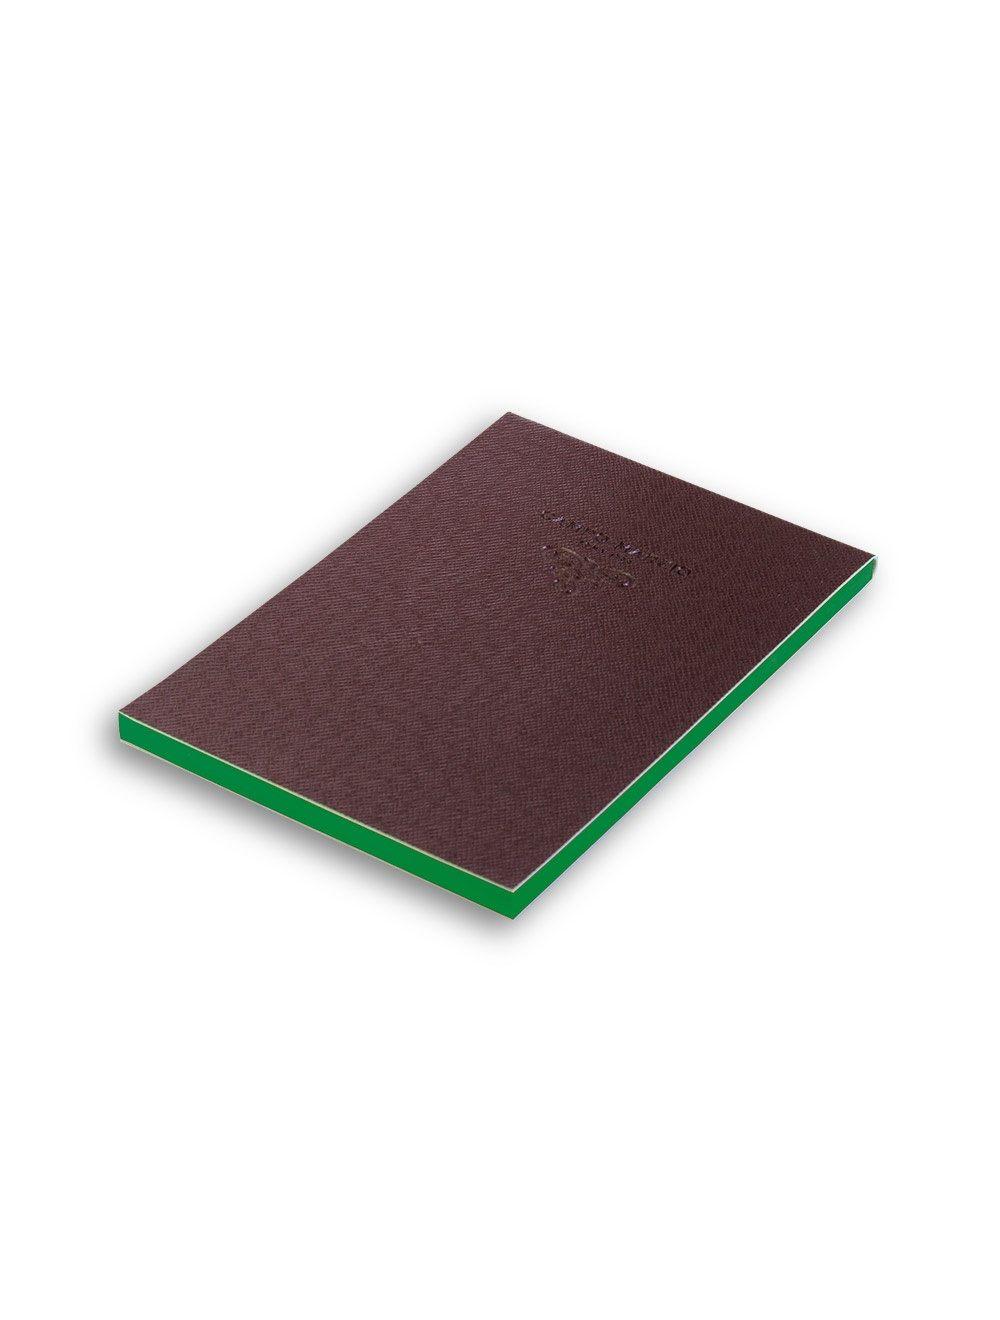 Notes 11x16 cm Saffiano - Brown